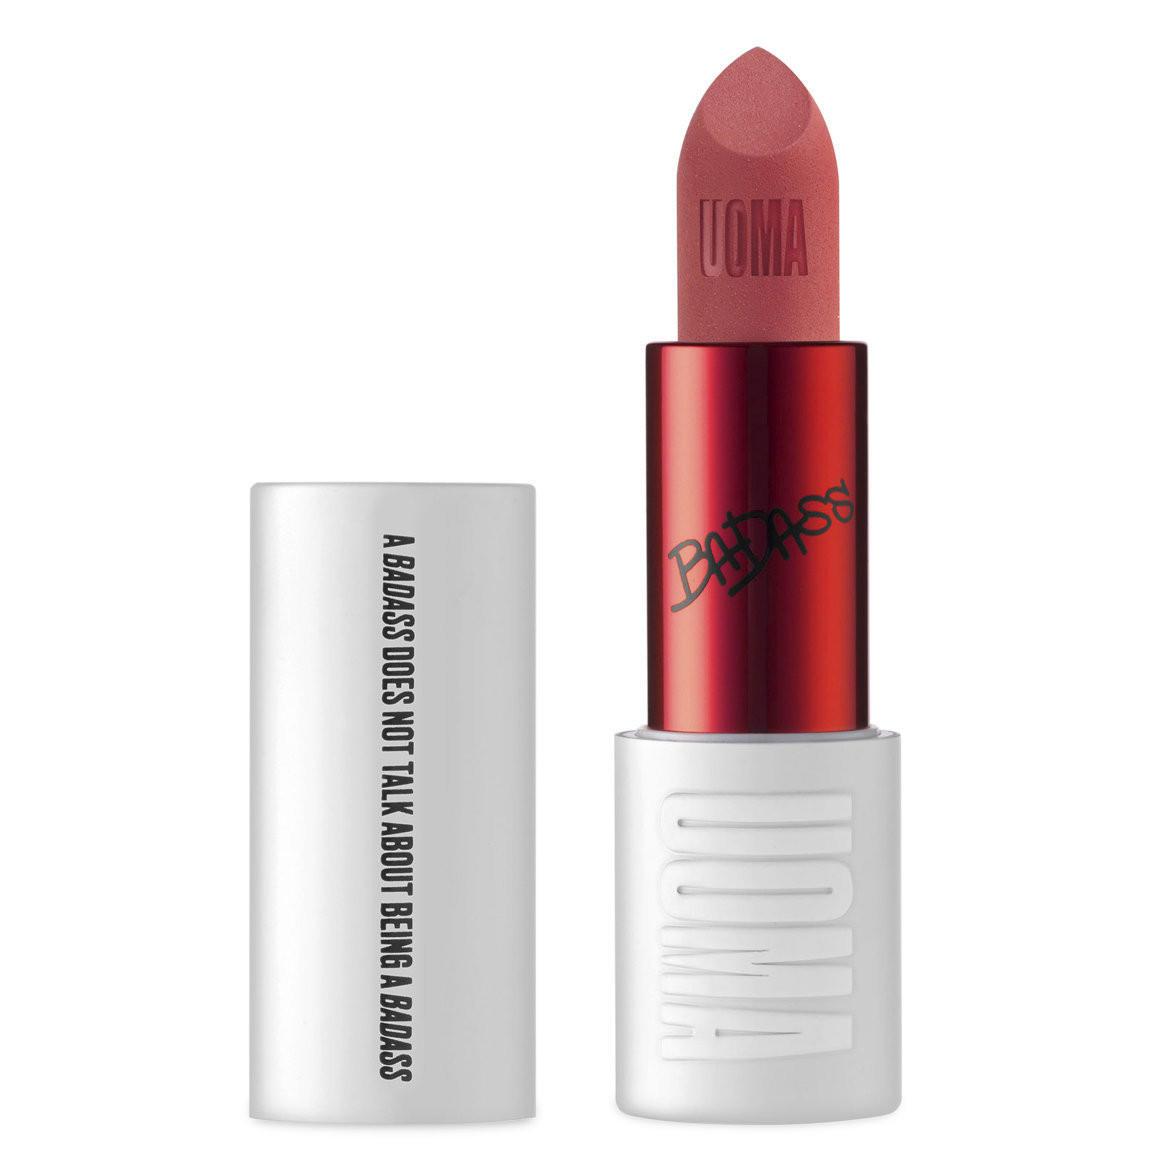 UOMA Beauty BadAdd Icon Matte Lipstick Coretta